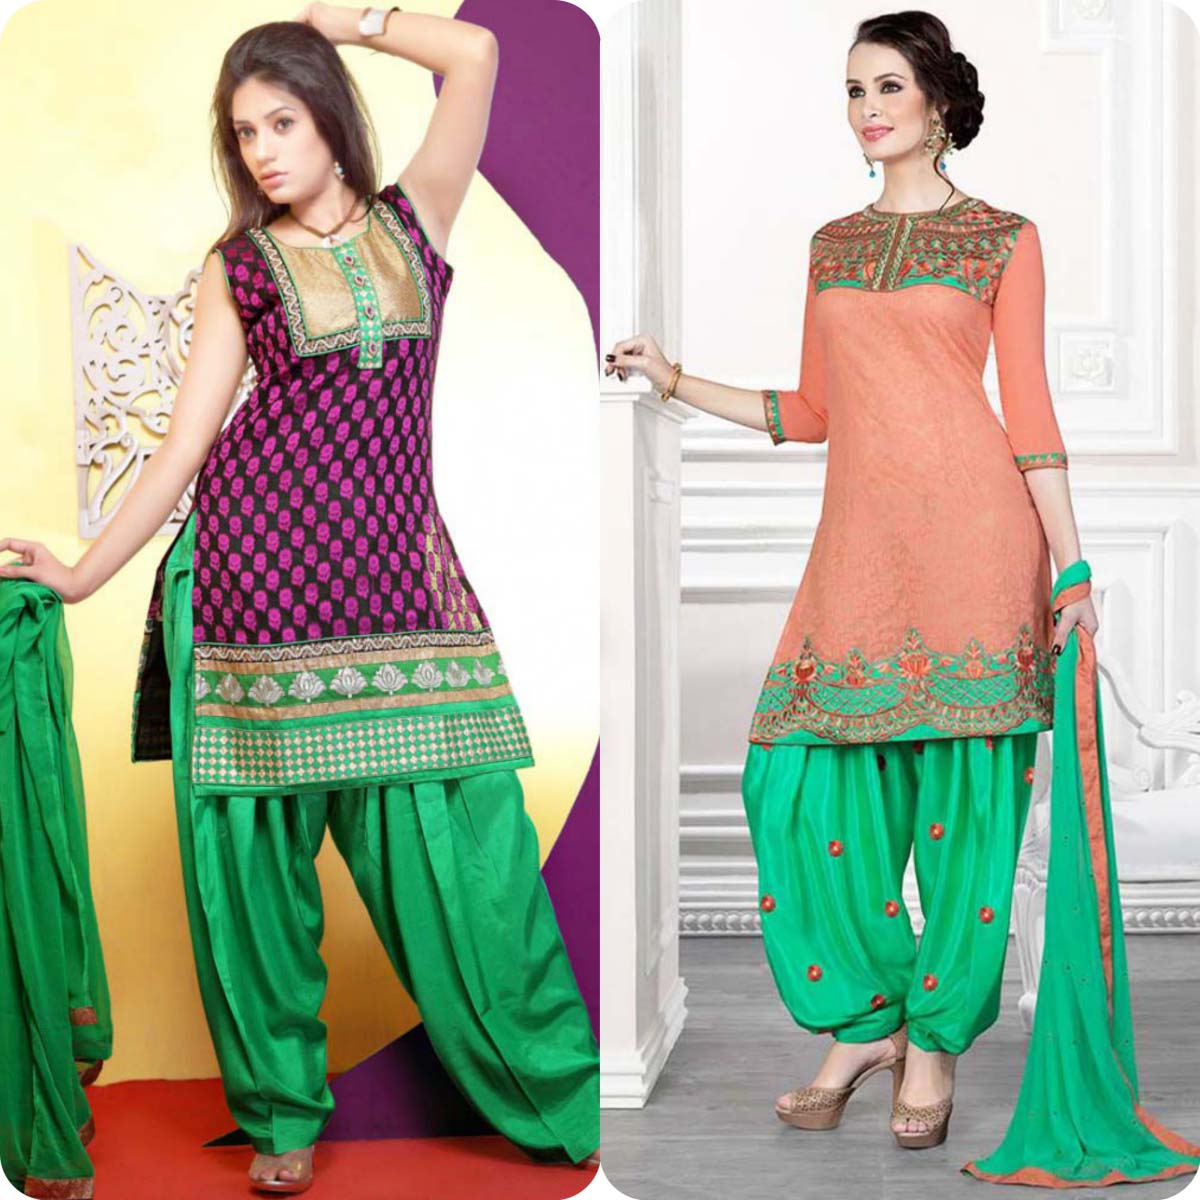 Latest Pakistani and Indian Patiala Shalwar Kameez Suits Designs (4)